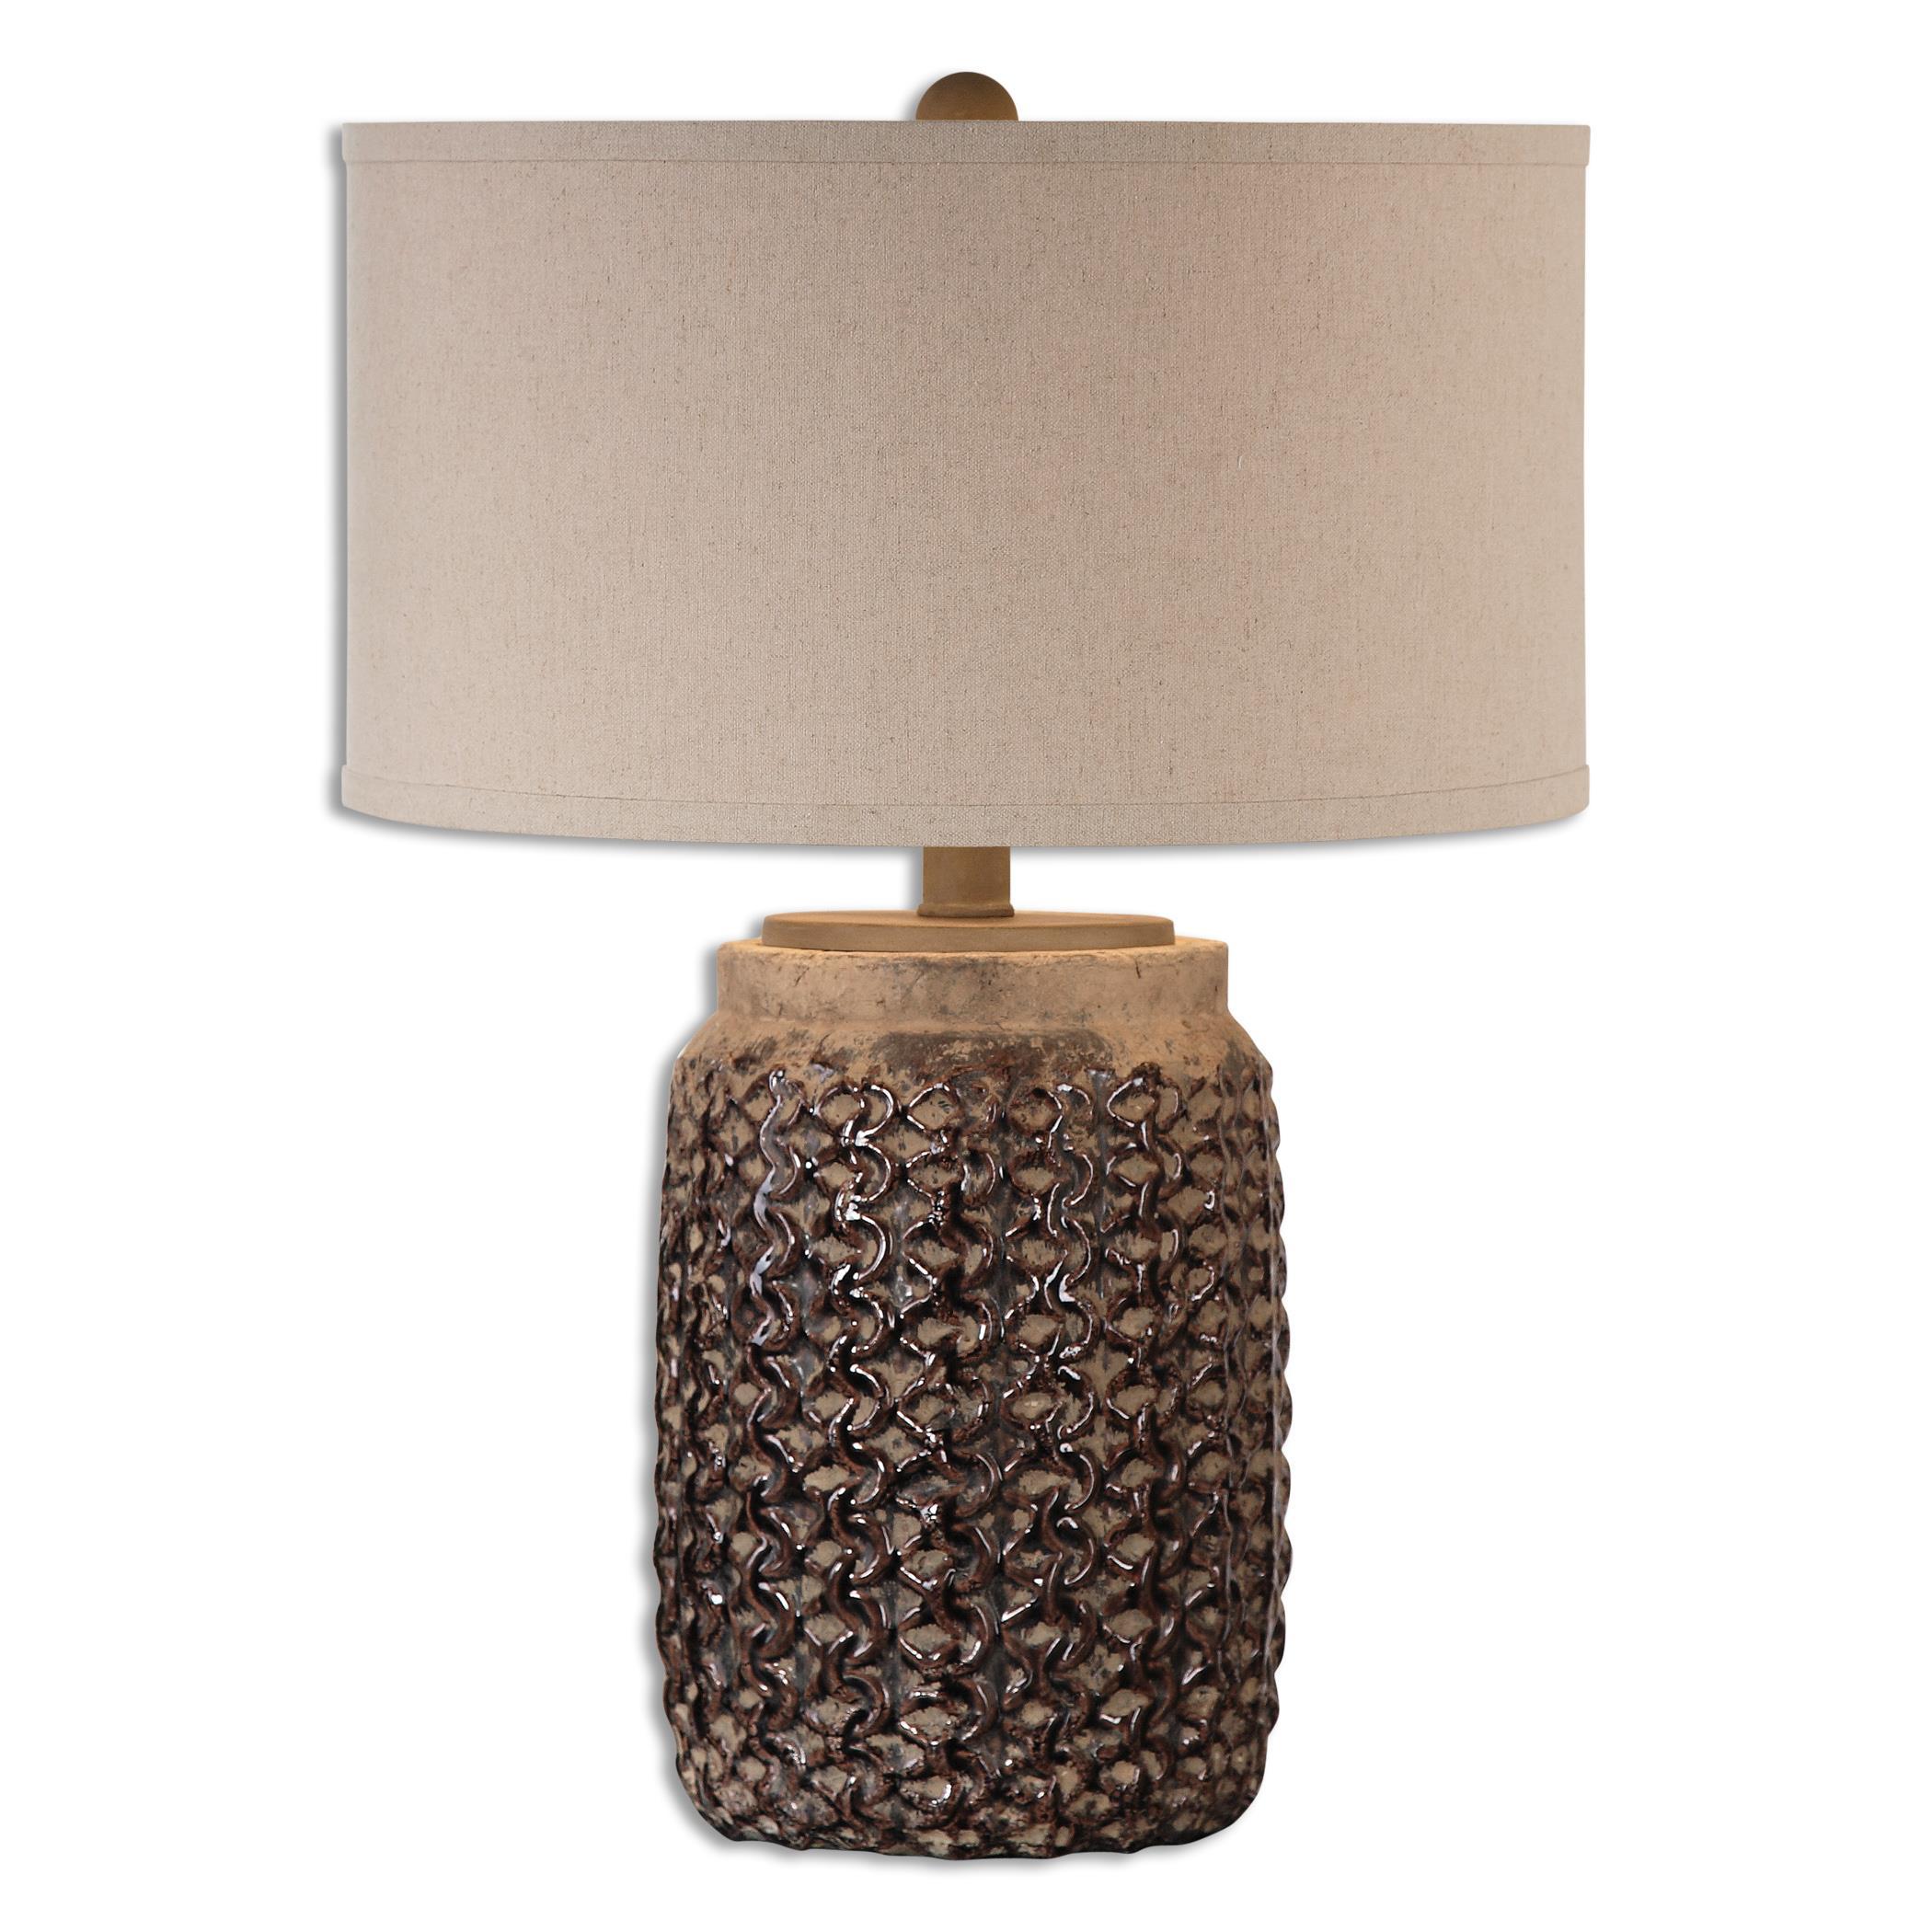 Bucciano Textured Ceramic Table Lamp